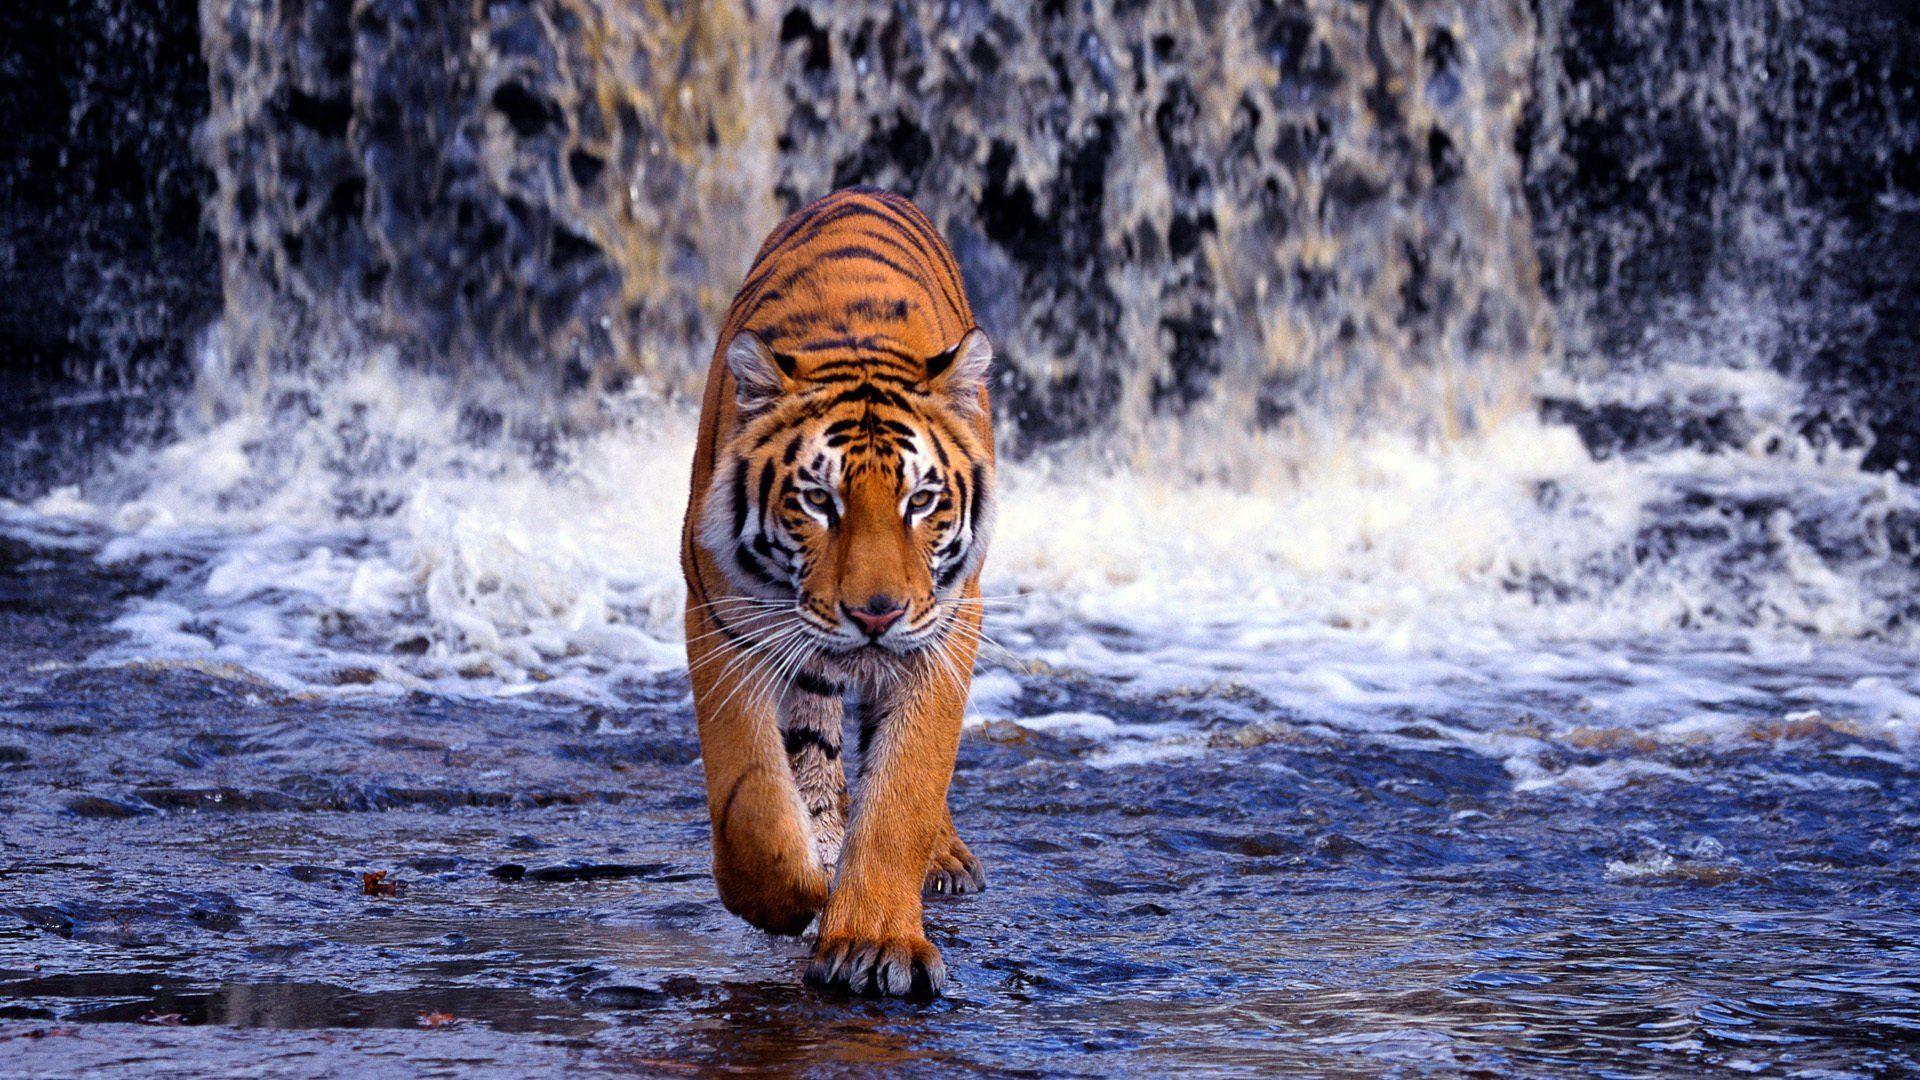 hd tiger photo